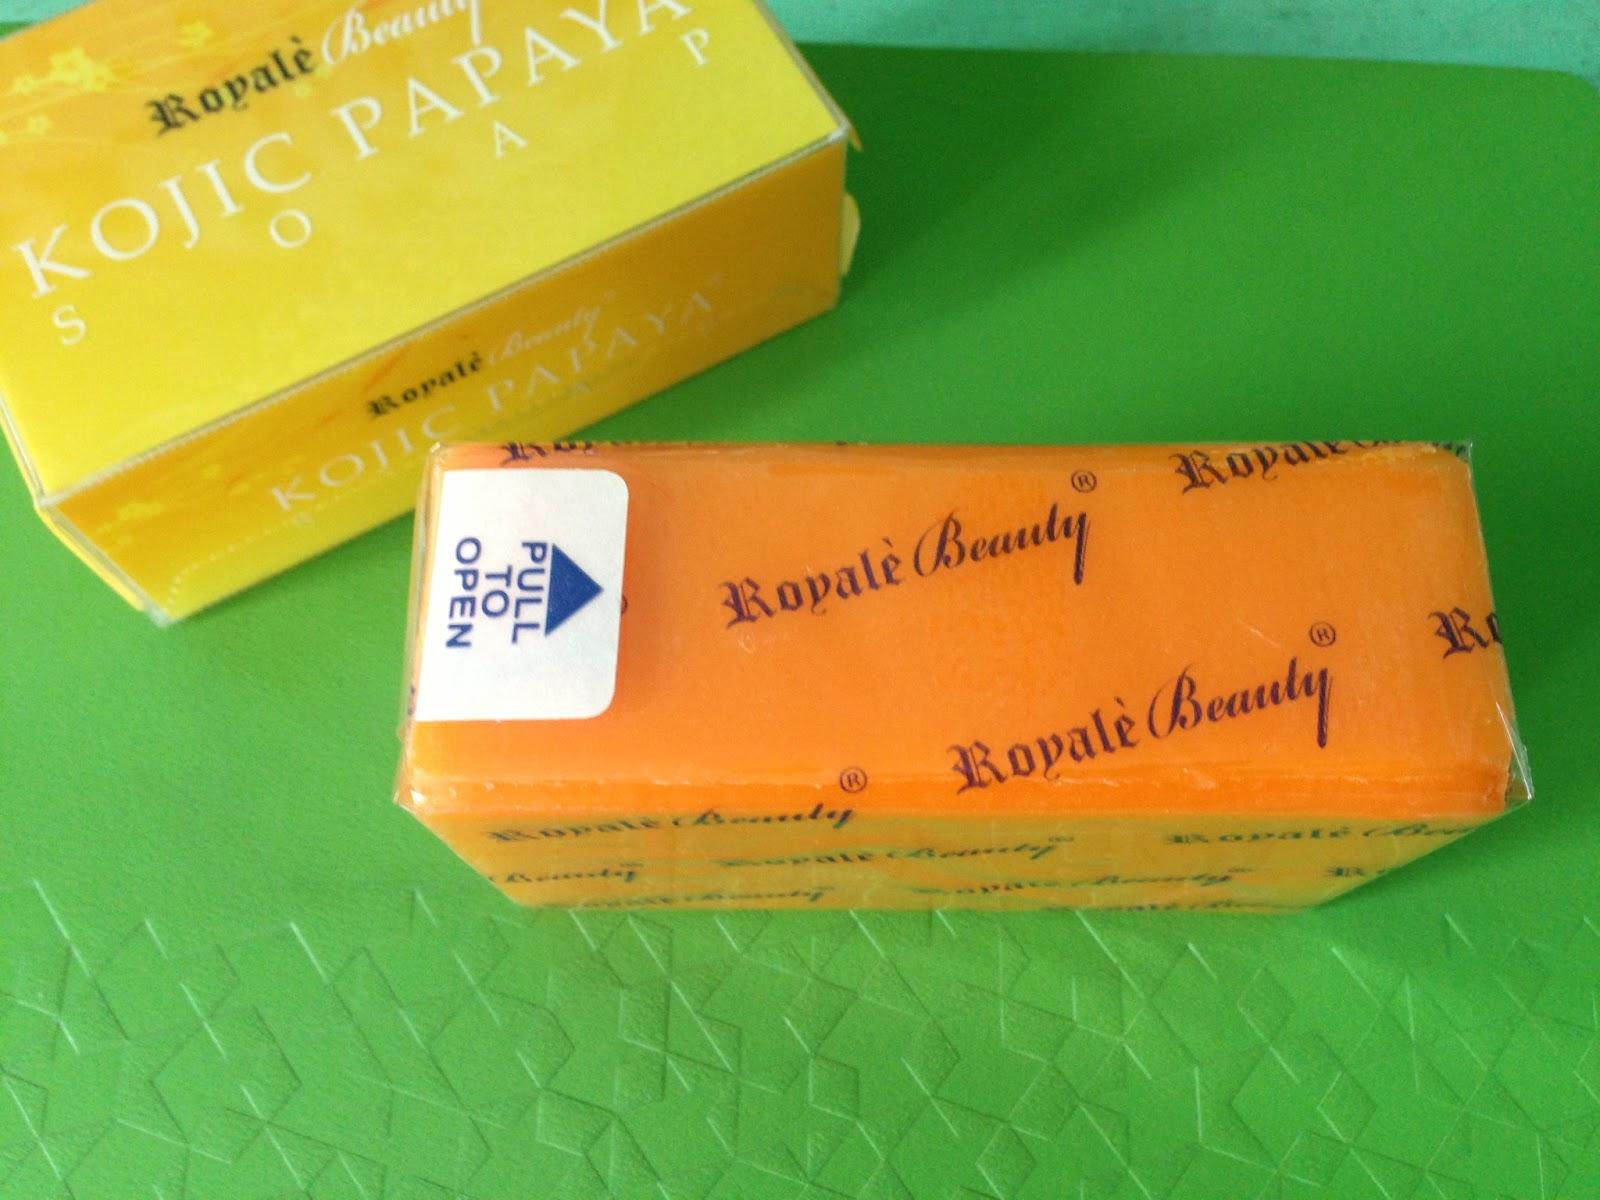 Ricetta Papaya Royale – Bevande